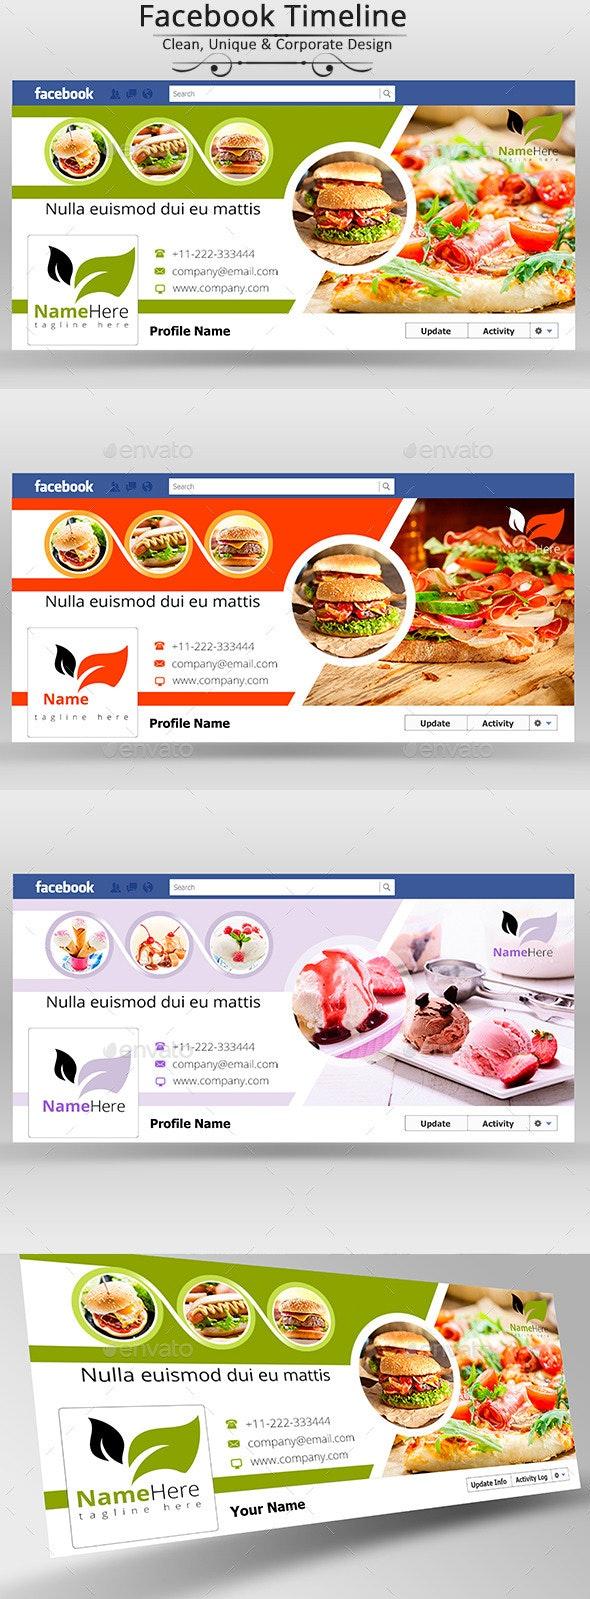 Food & Restaurants Facebook Covers - Facebook Timeline Covers Social Media